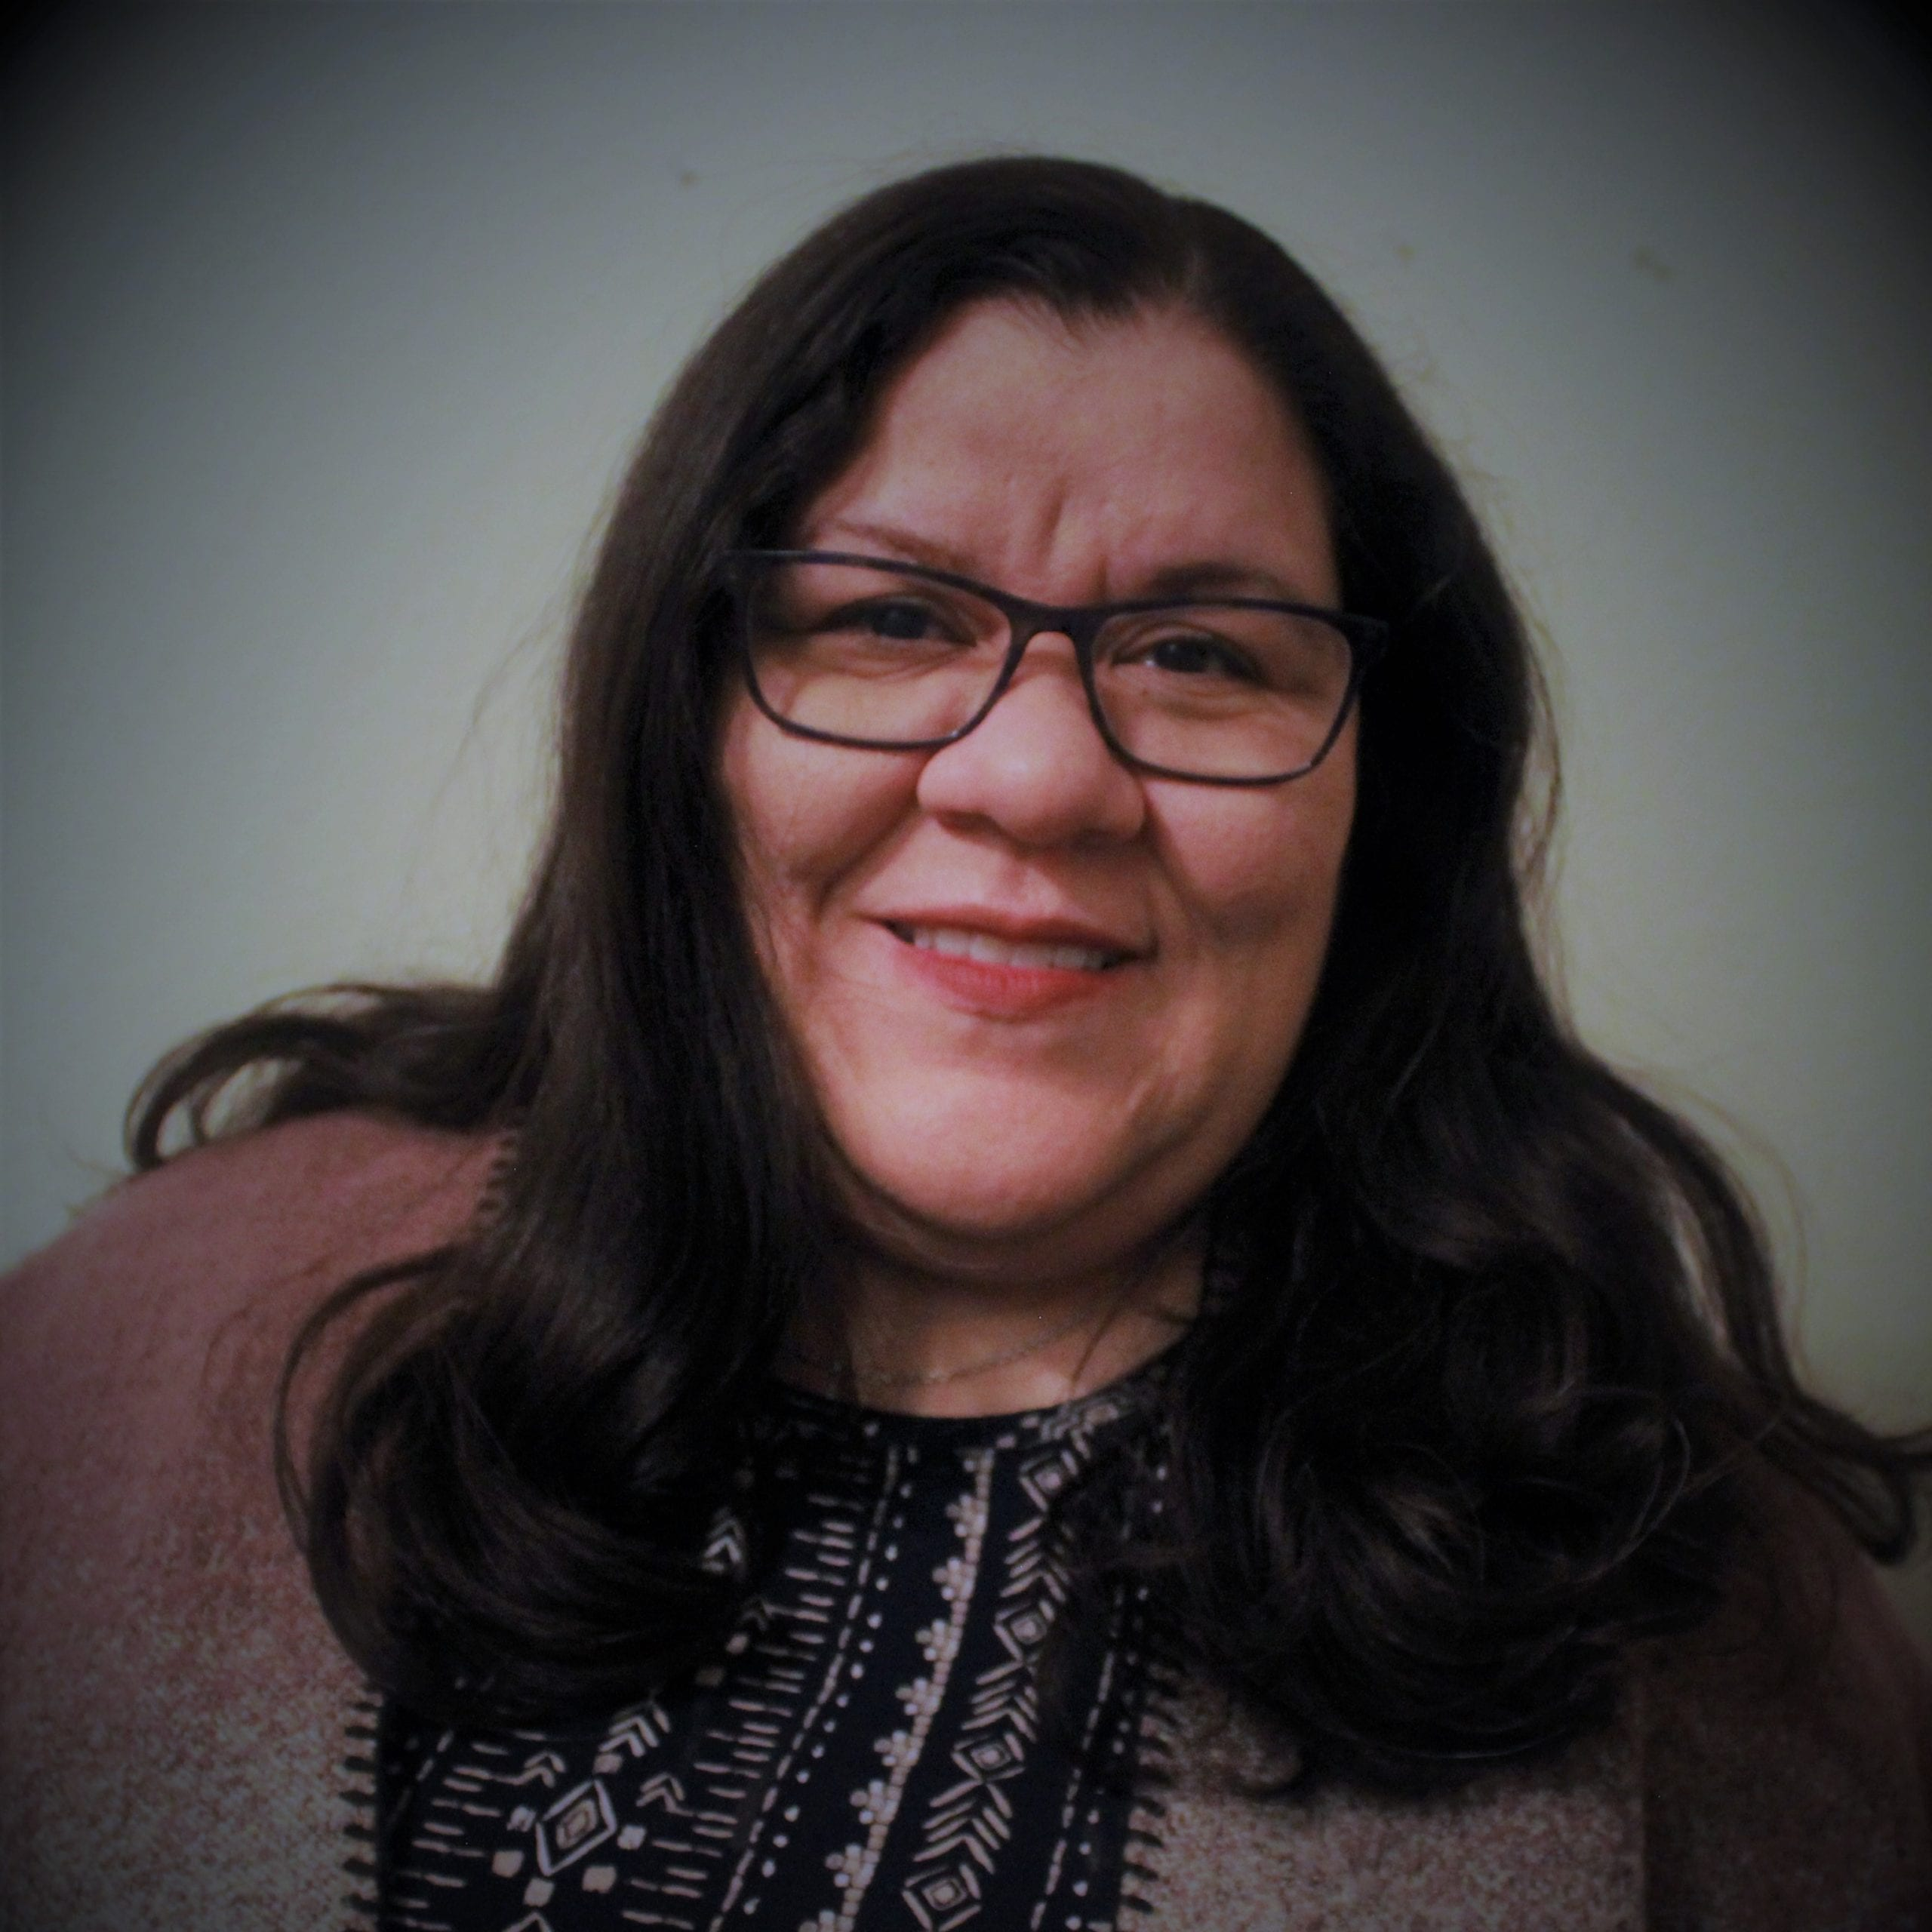 Madeline Ortiz